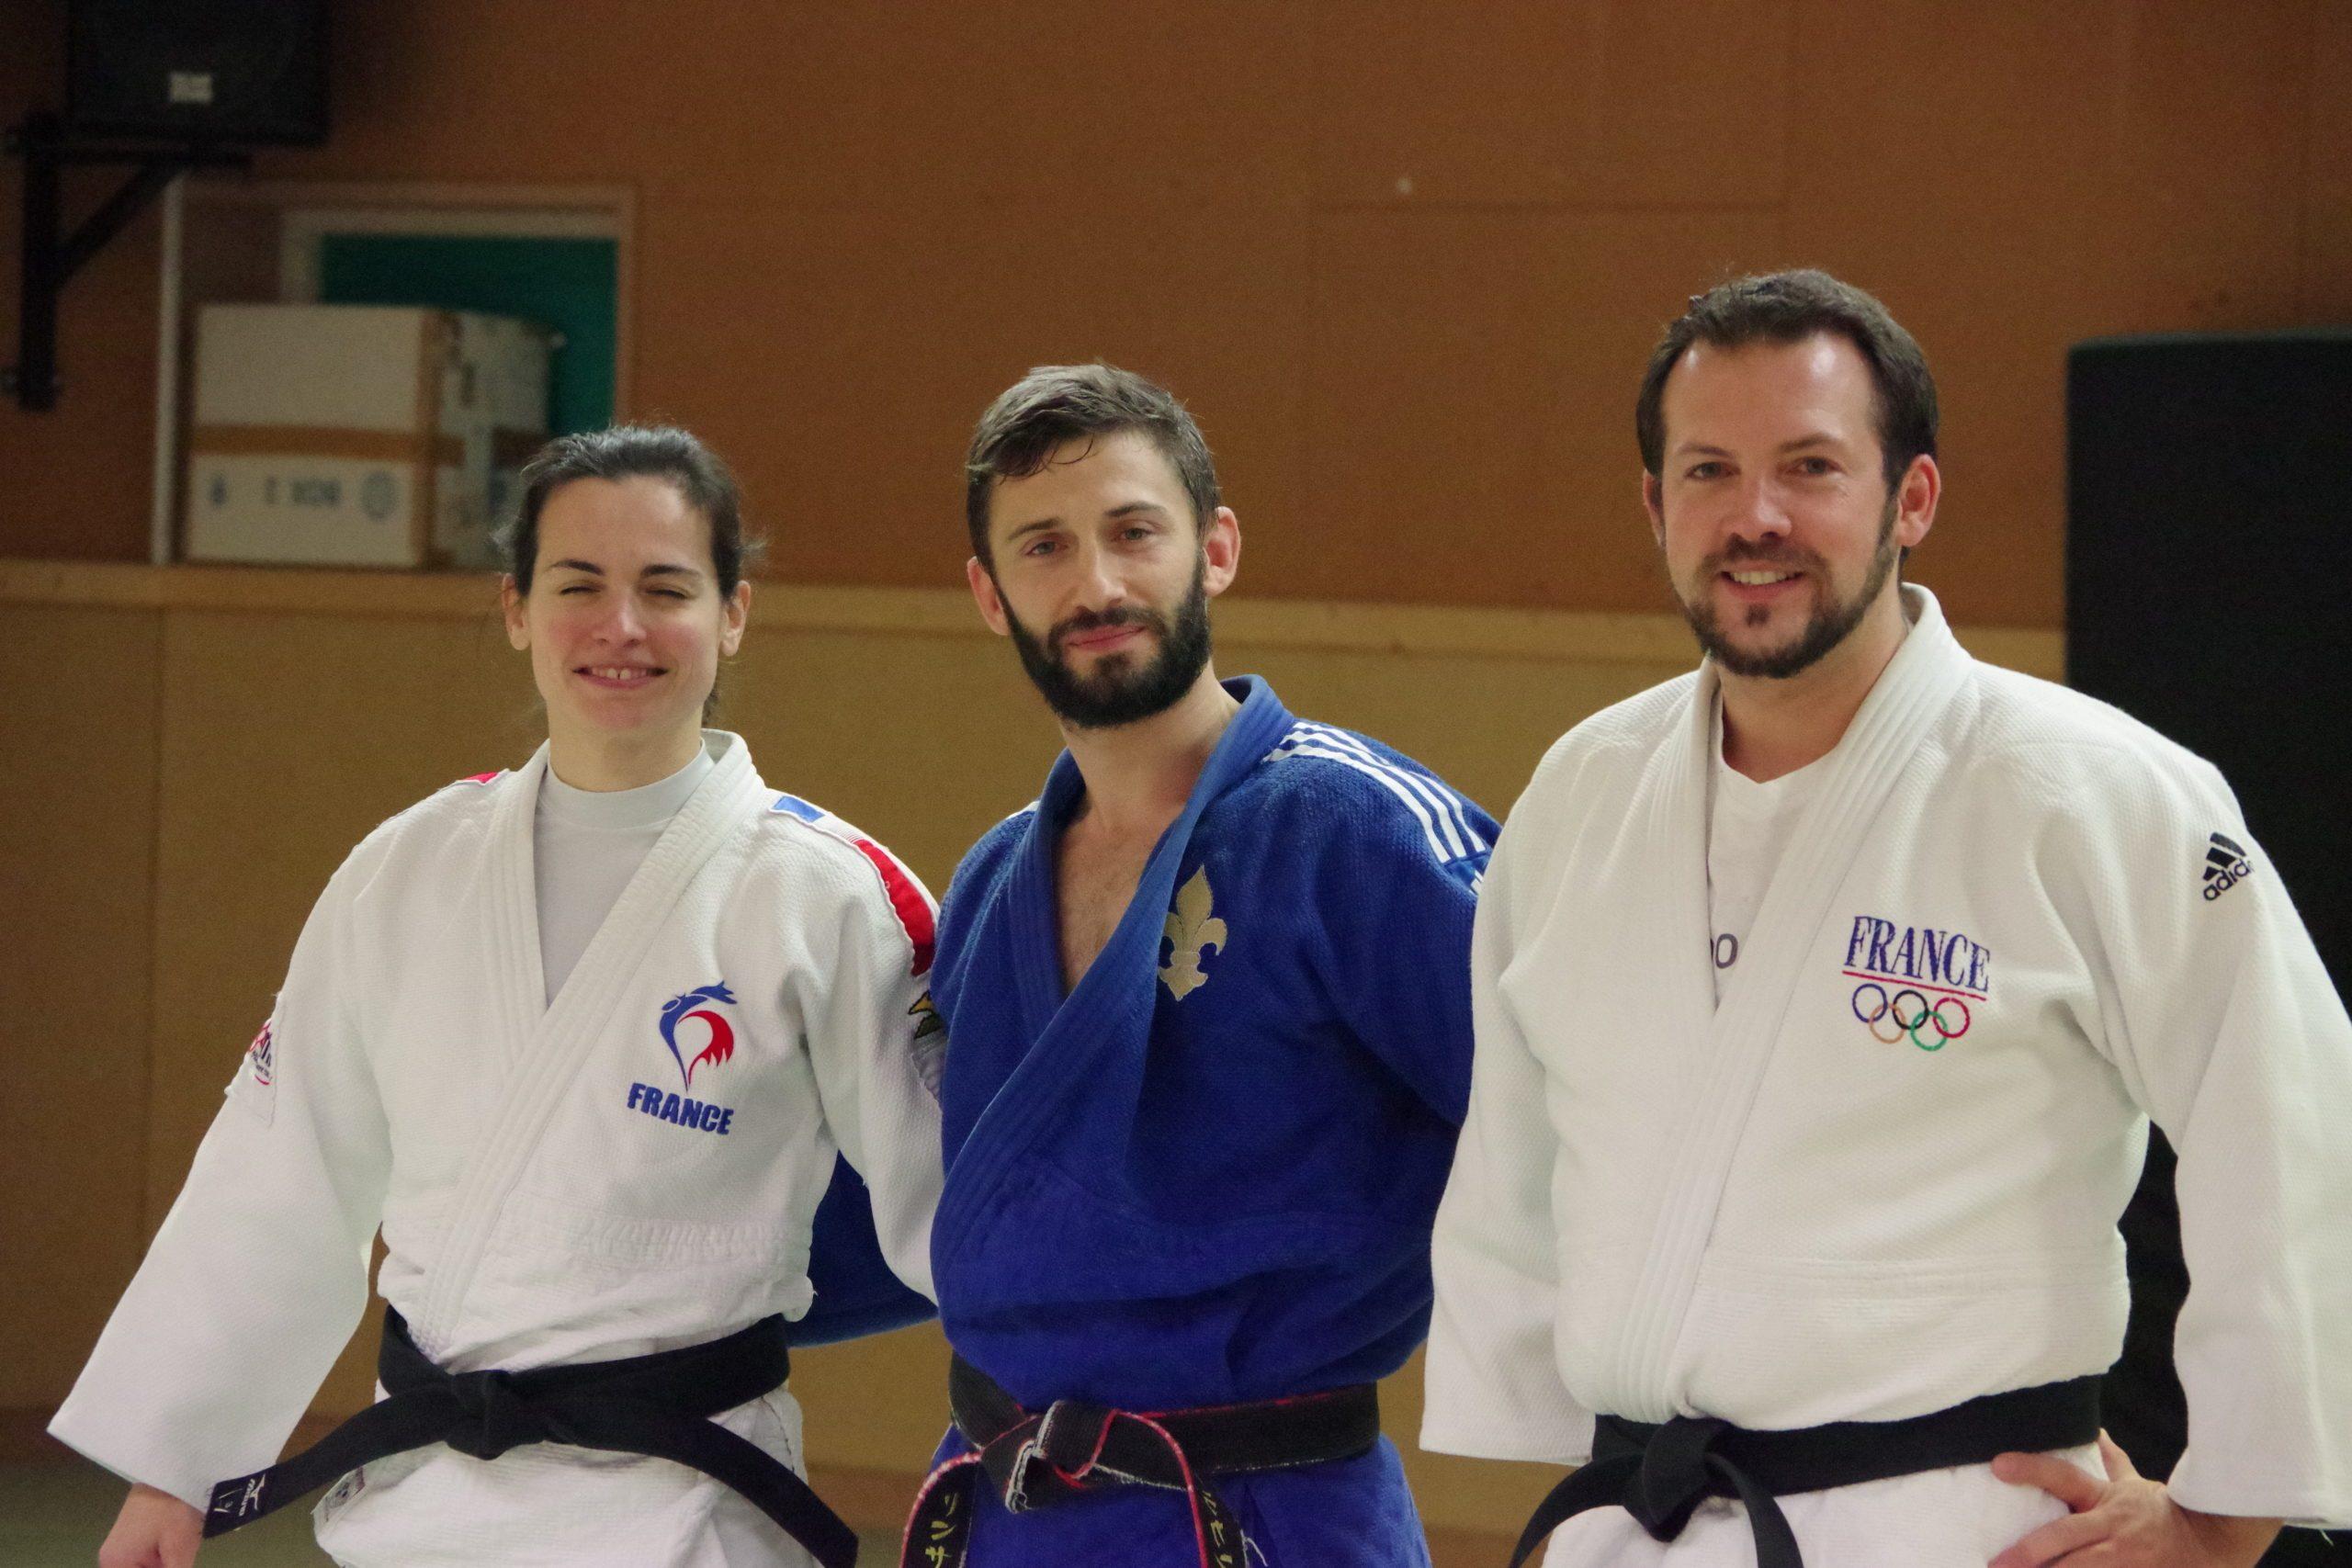 2019.12.18-Entrainement-Judo-avec-Sandrine-MARTINET-7-scaled